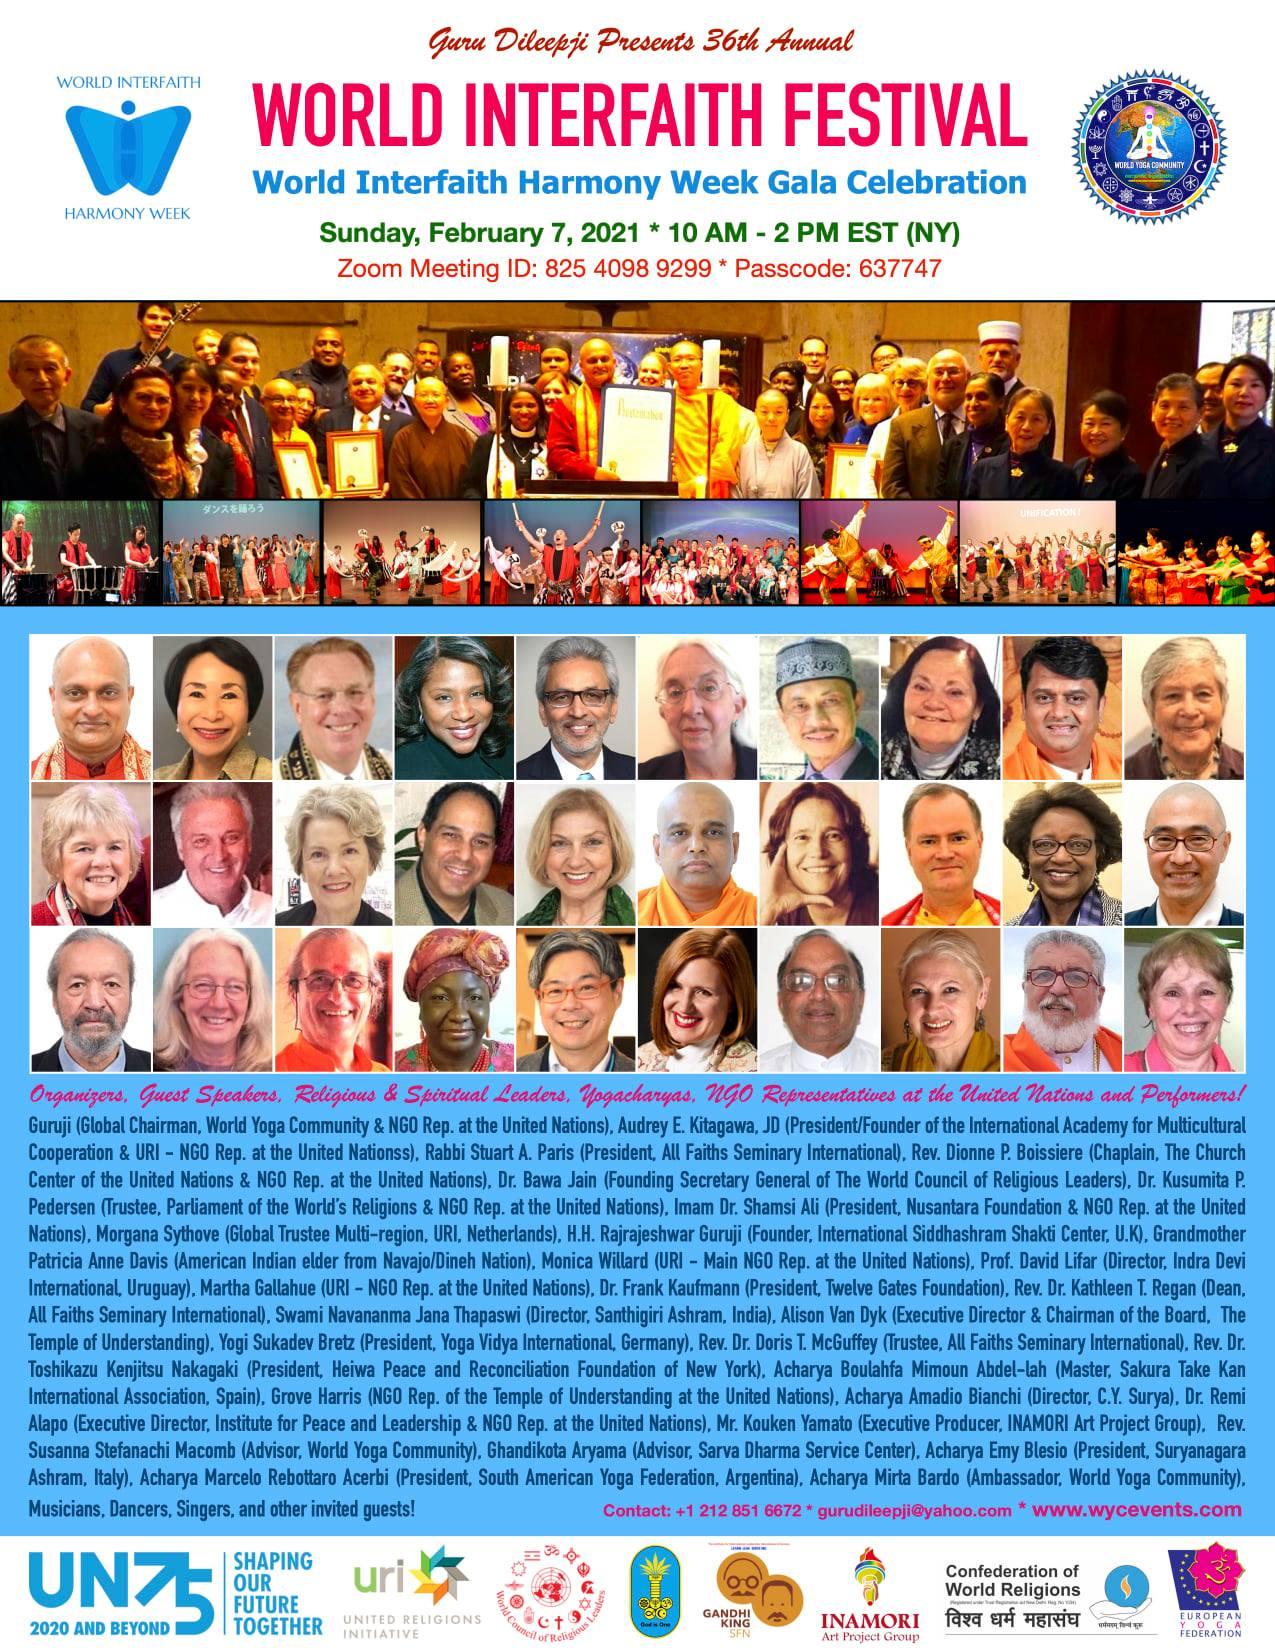 President of Twelve Gates Foundation To Speak At World Interfaith Harmony Week